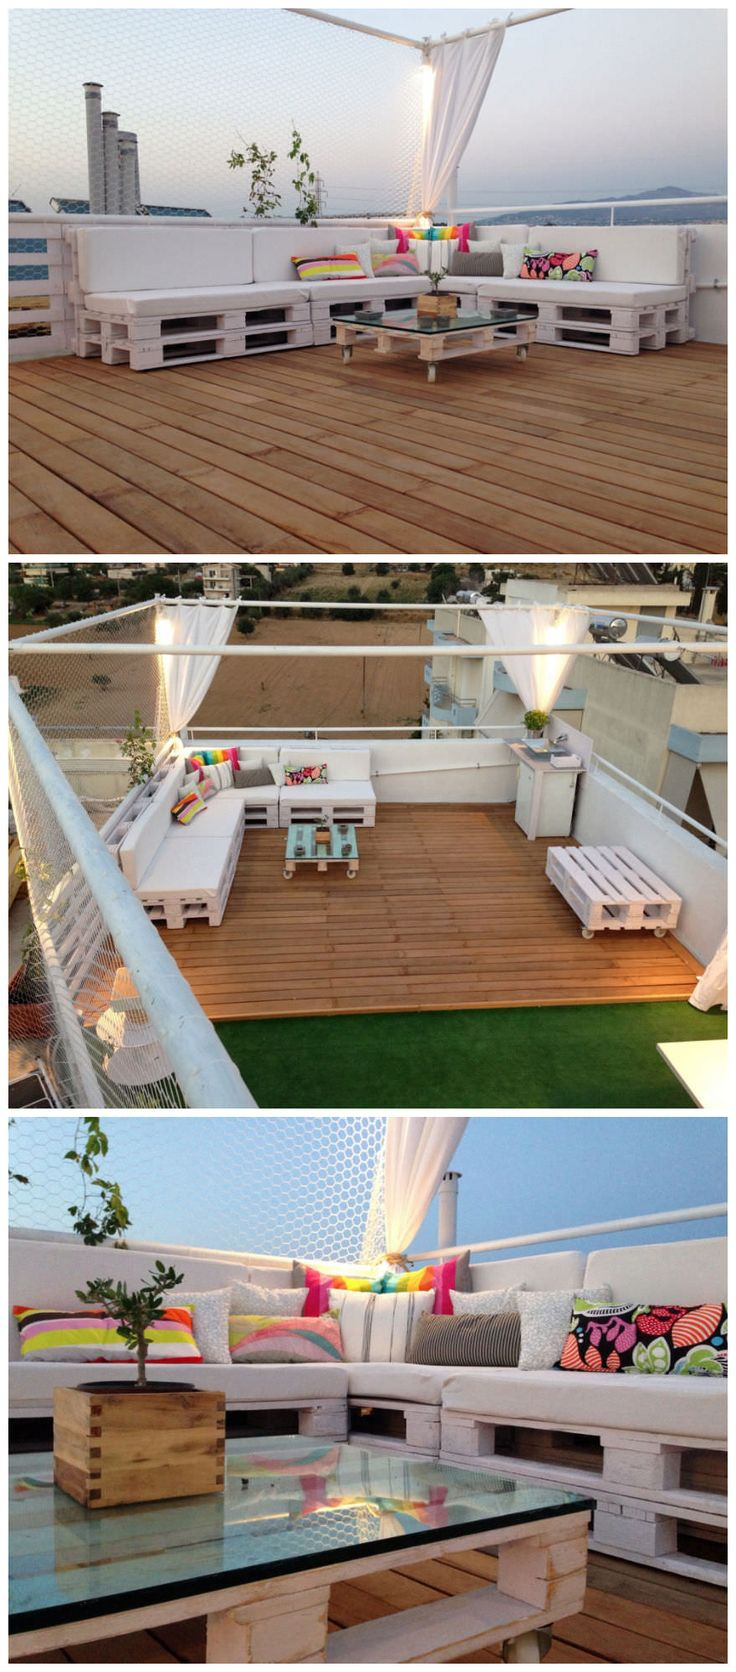 Terraza #lounge con pallets. Me encanta!